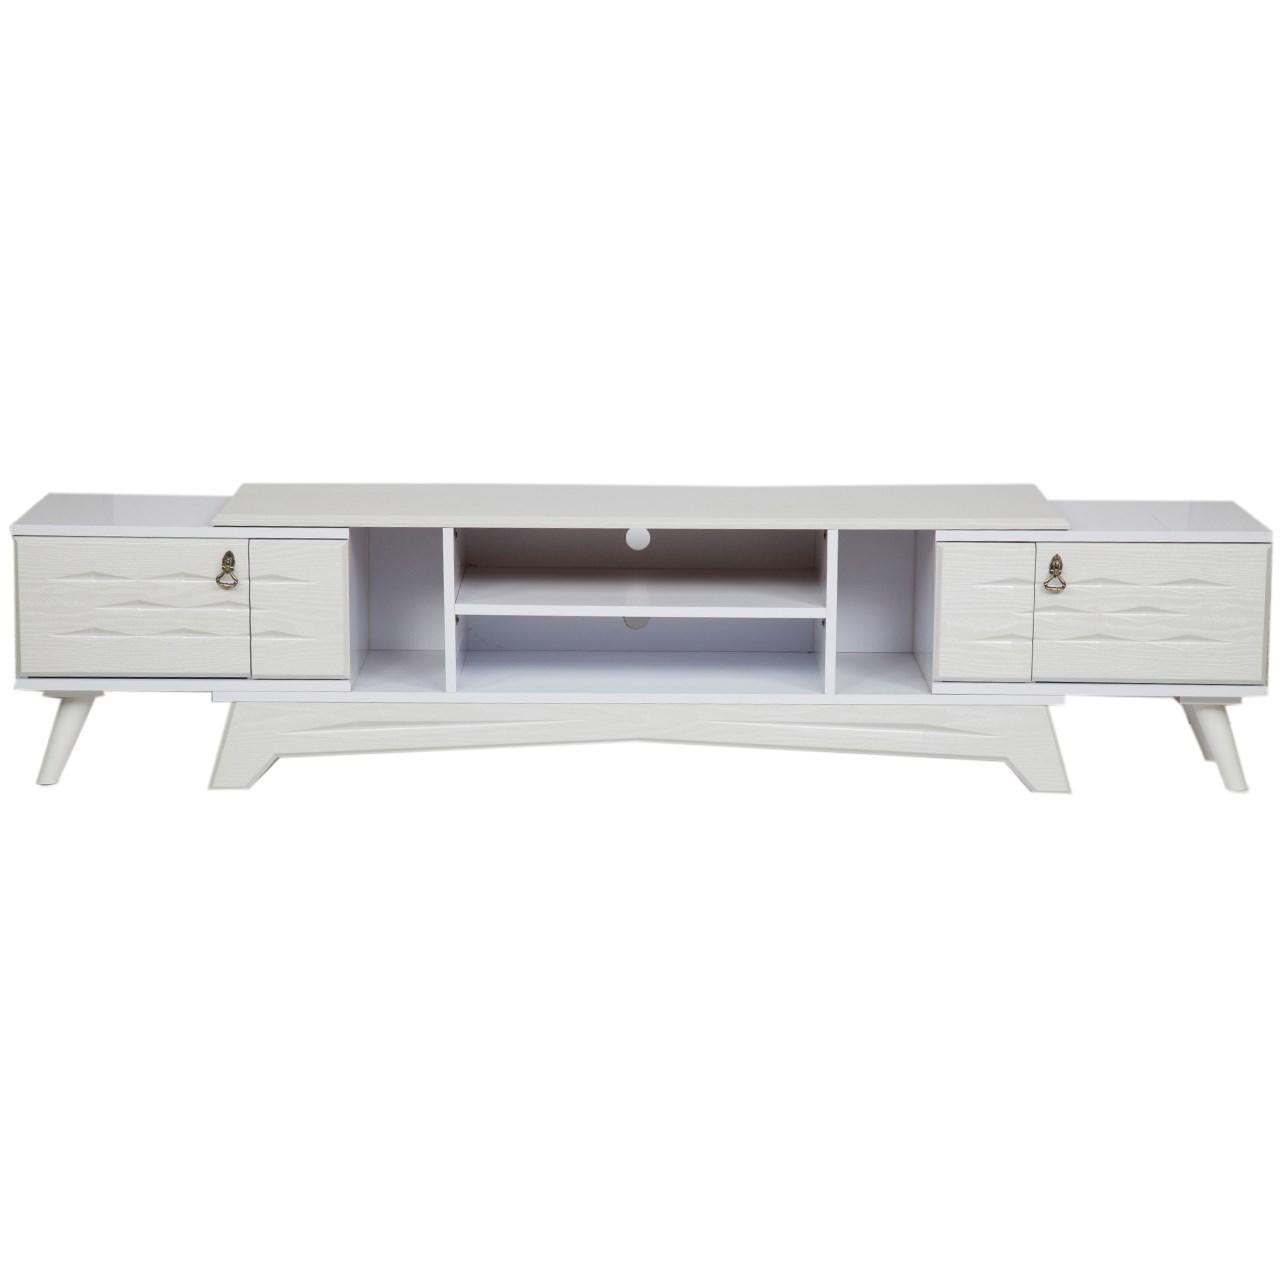 میز تلویزیون کارماچوب مدل M103 رنگ سفید